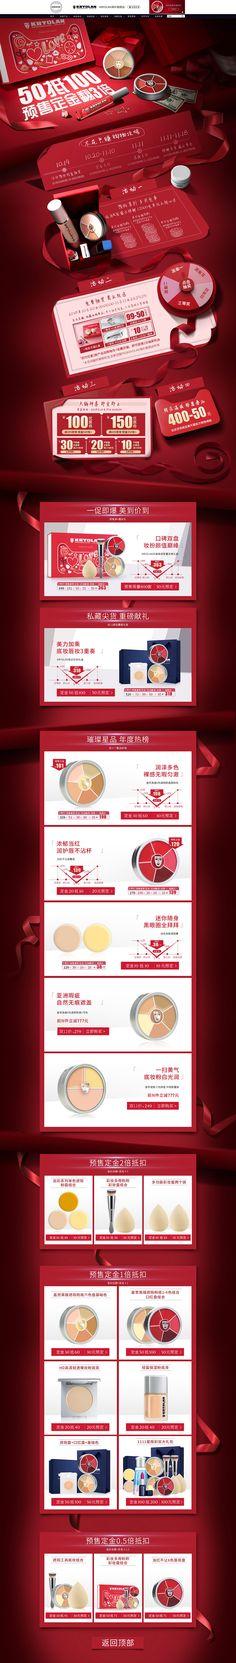 Cv Design, Layout Design, Branding Design, Logo Design, Graphic Design, Event Landing Page, Event Page, Makeup Ads, Asian Design